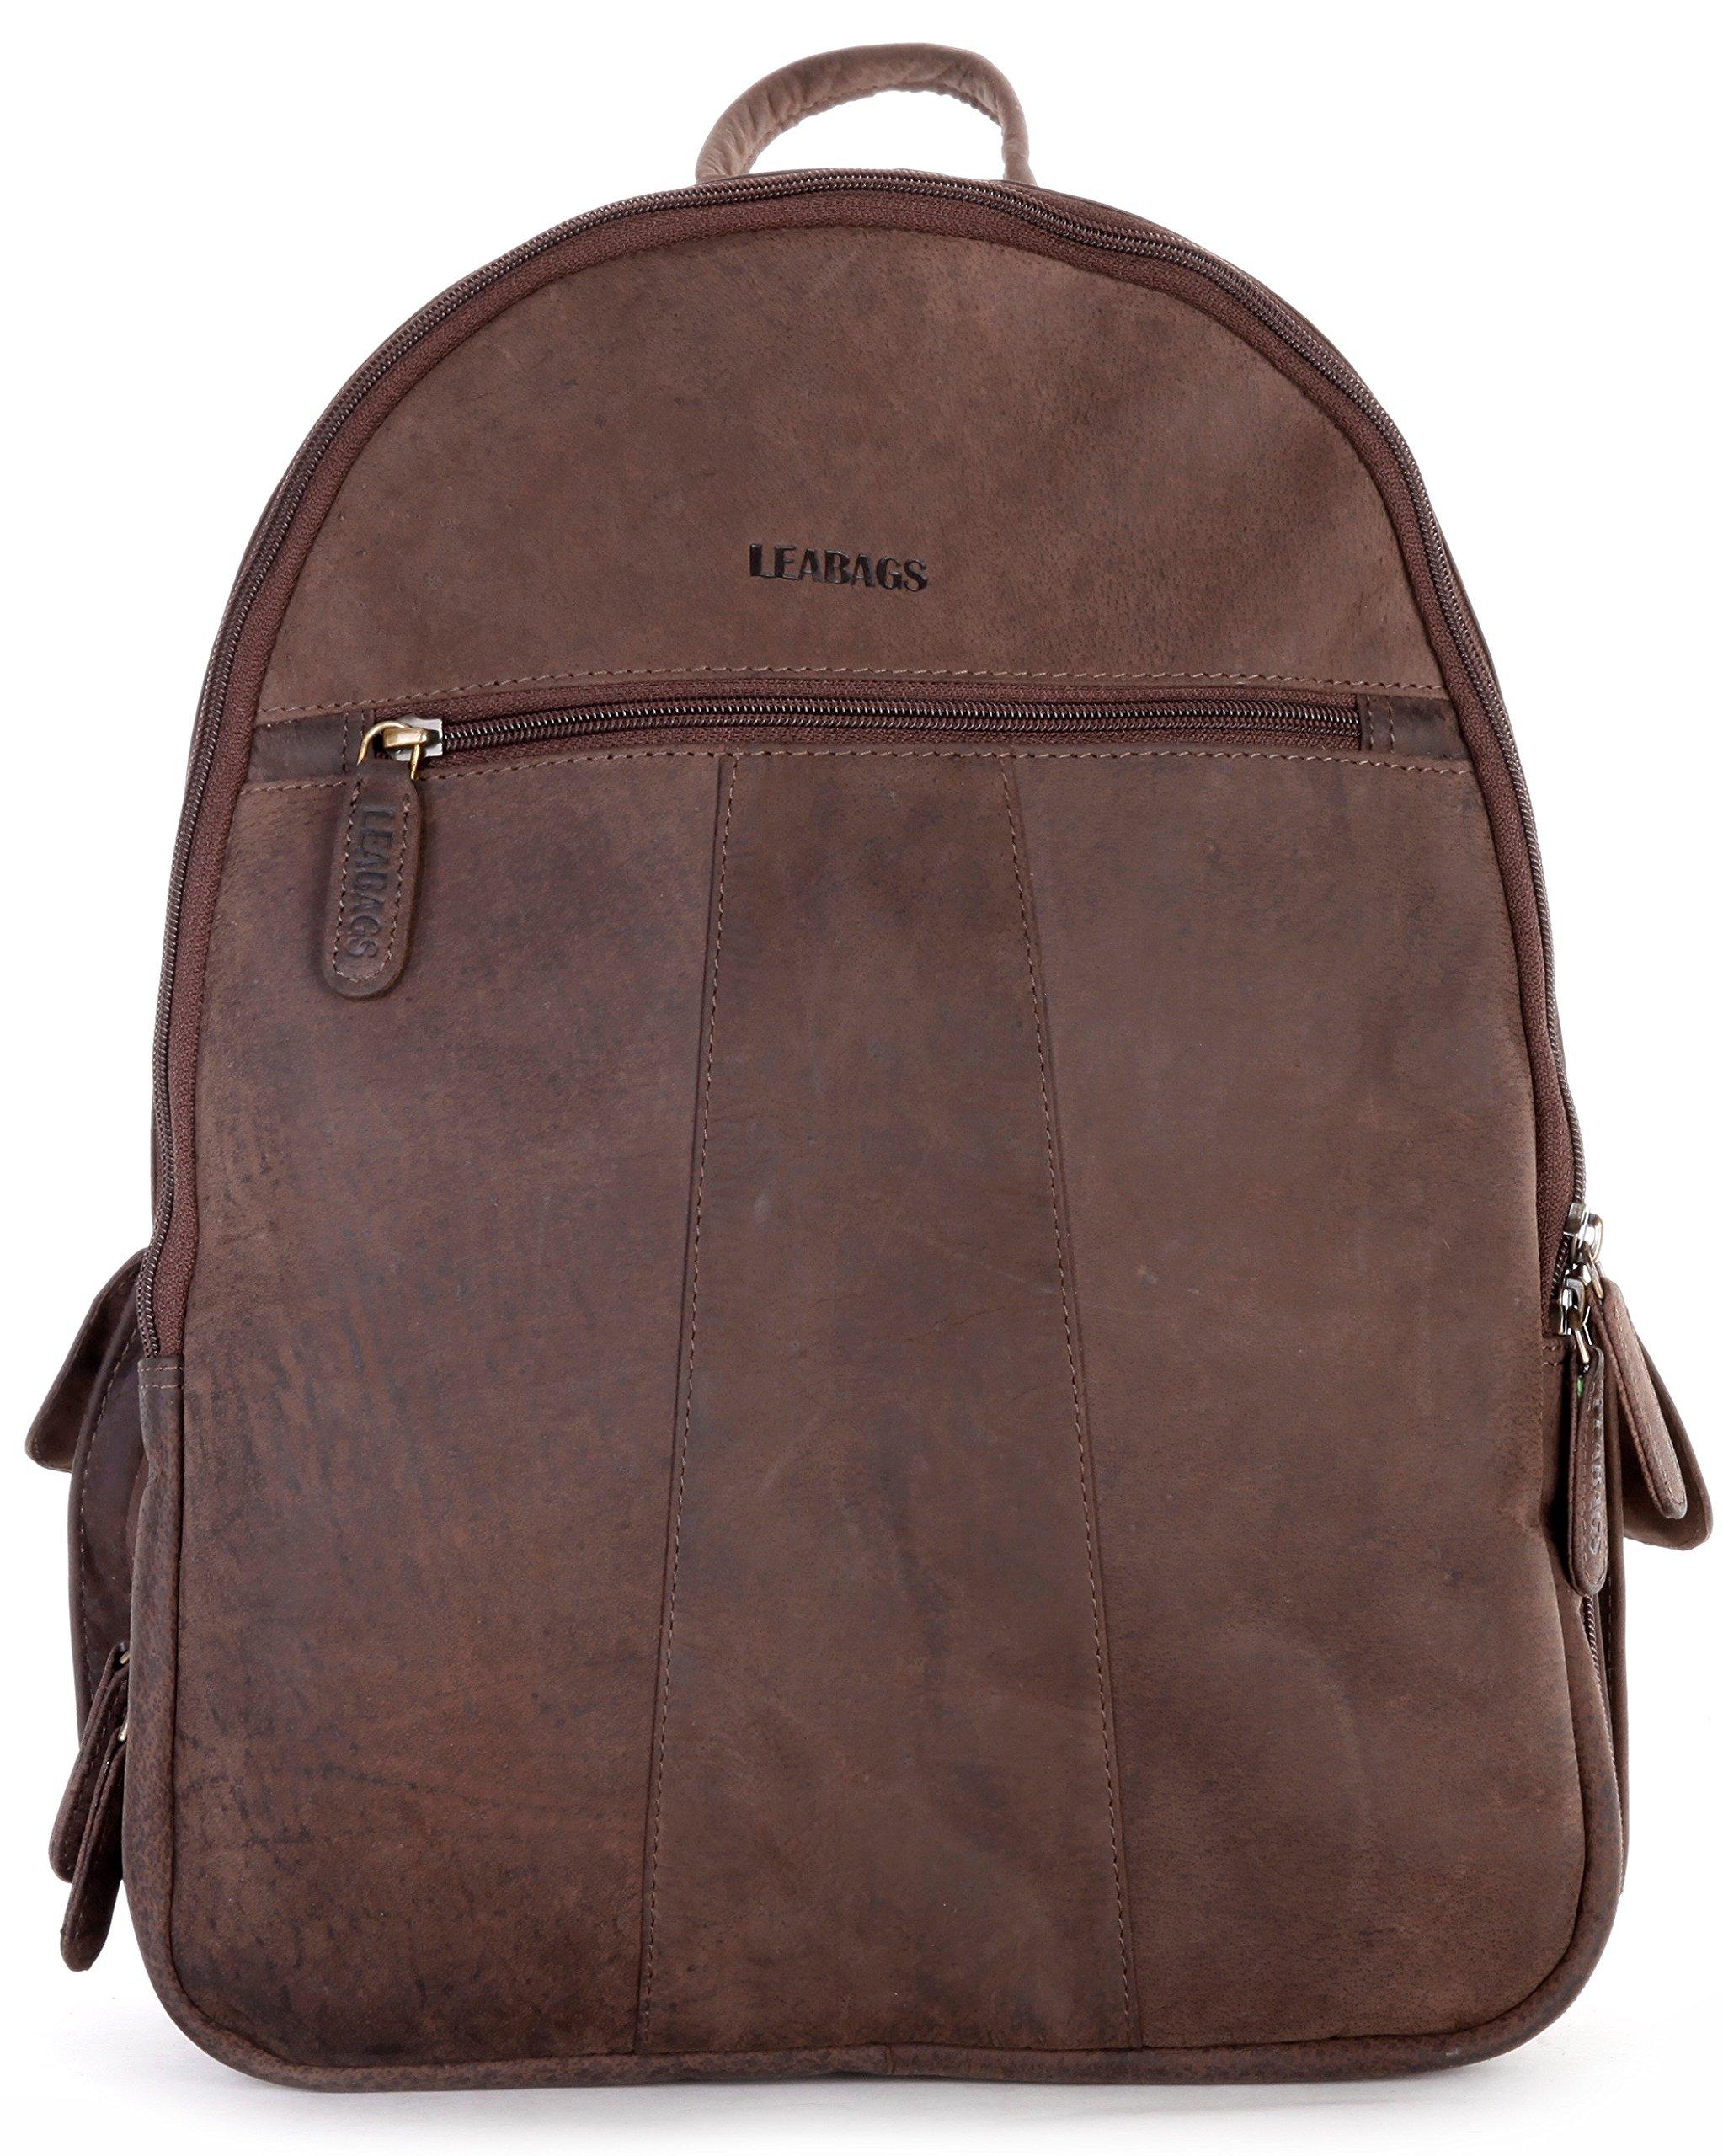 LEABAGS Newark genuine buffalo leather camera backpack in vintage style - Nutmeg